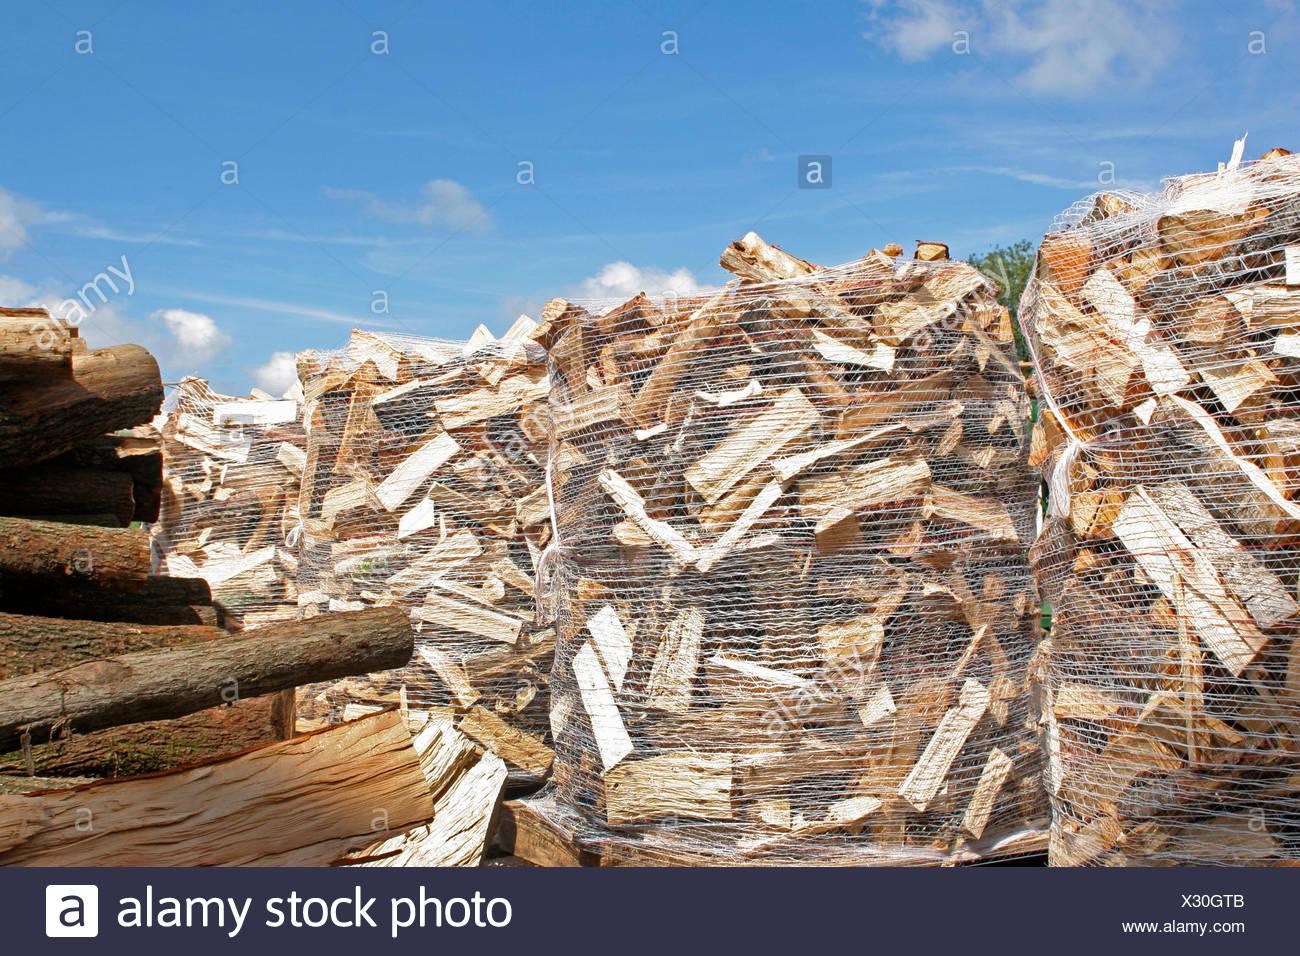 firewood working, storage area with sacks of firewood, Germany - Stock Image